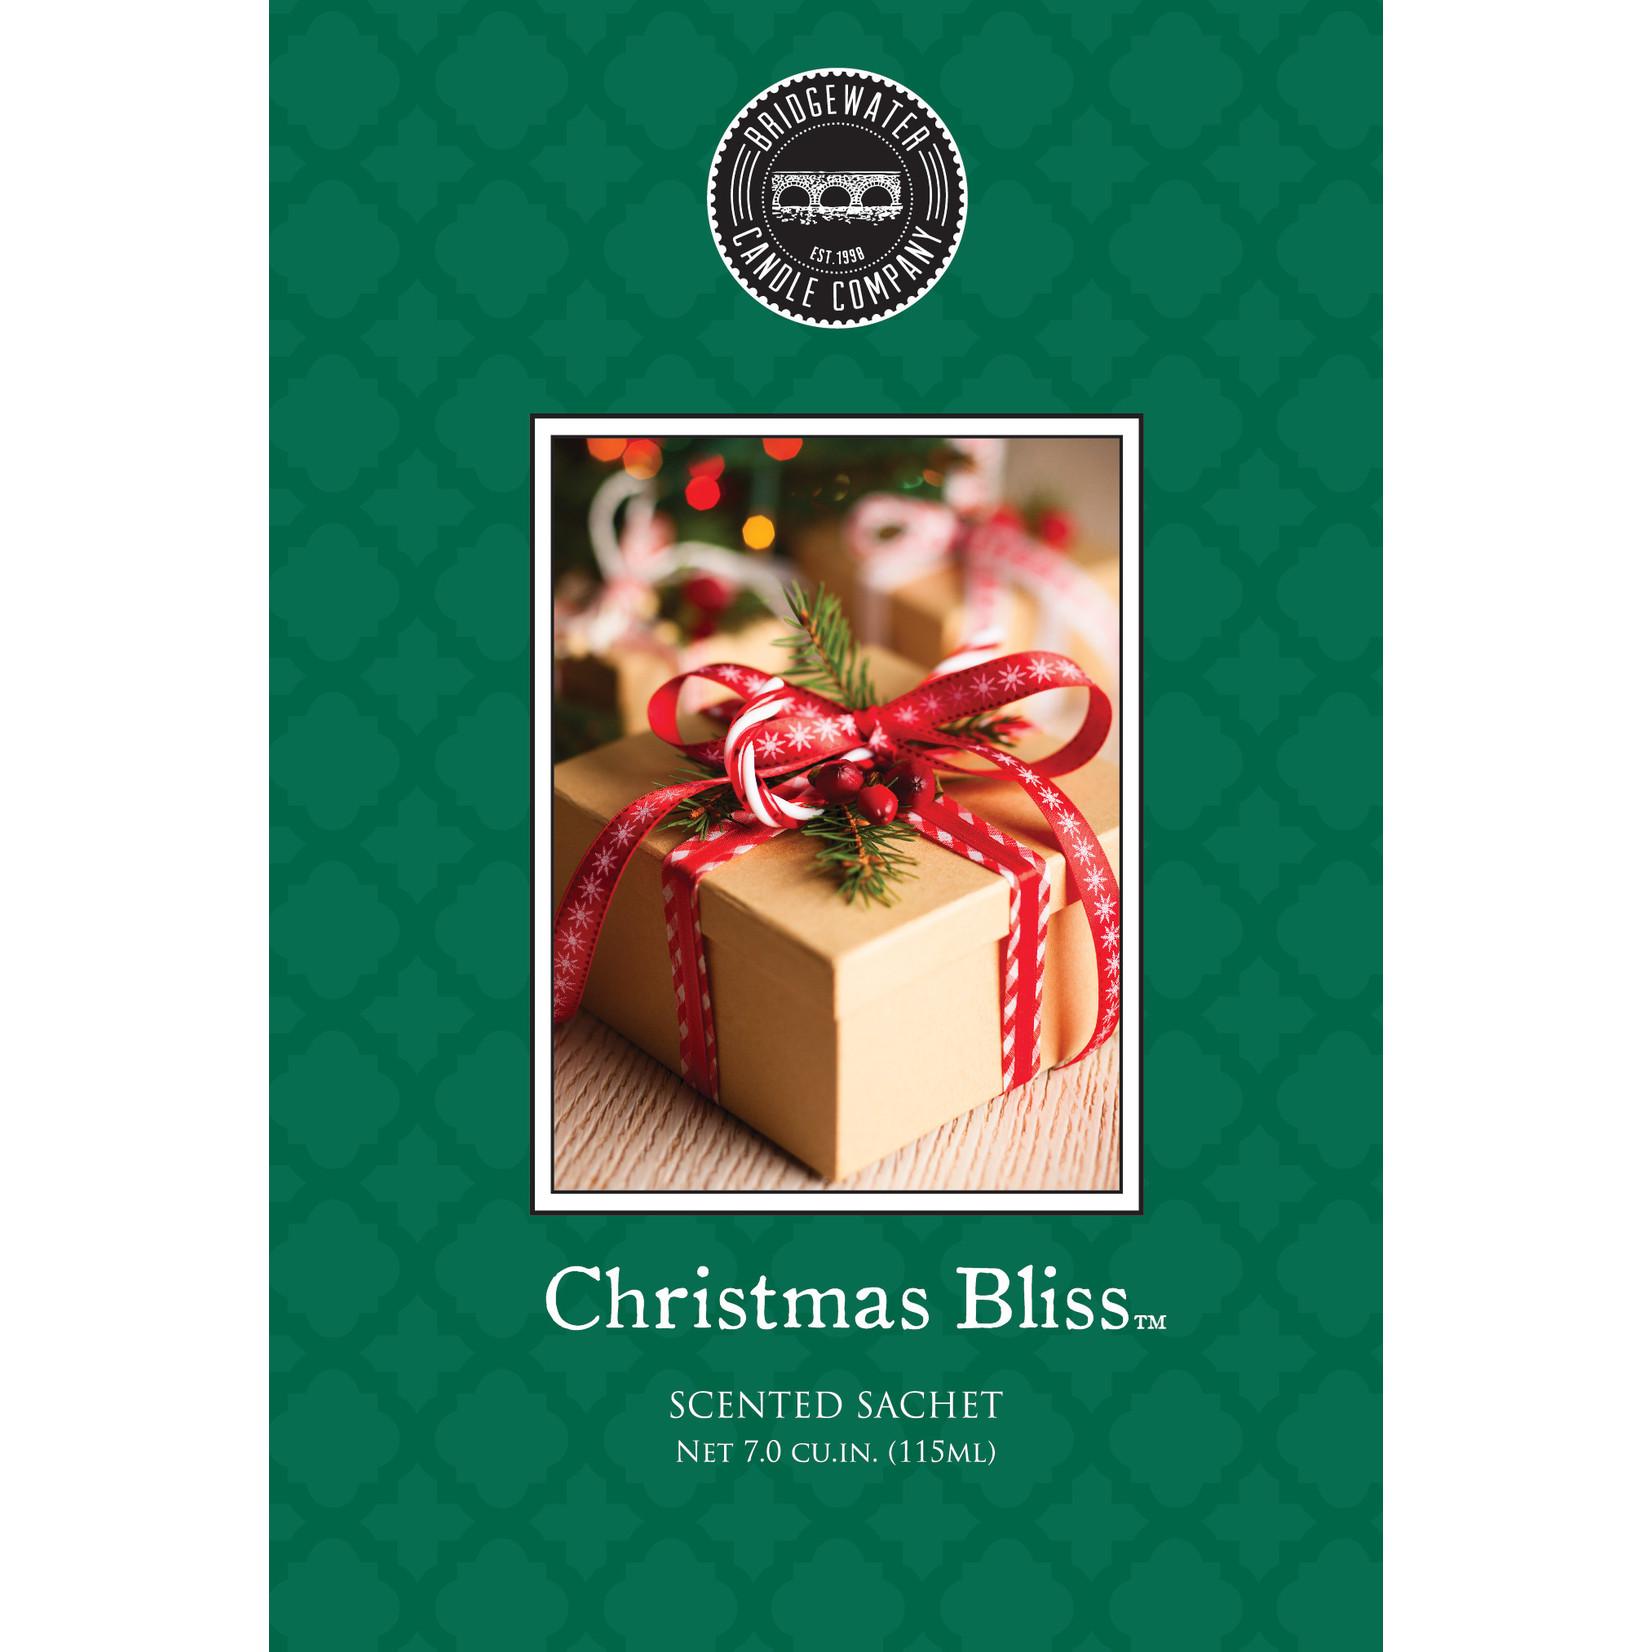 Bridgewater Scented Sachet / Geurzakje Christmas Bliss